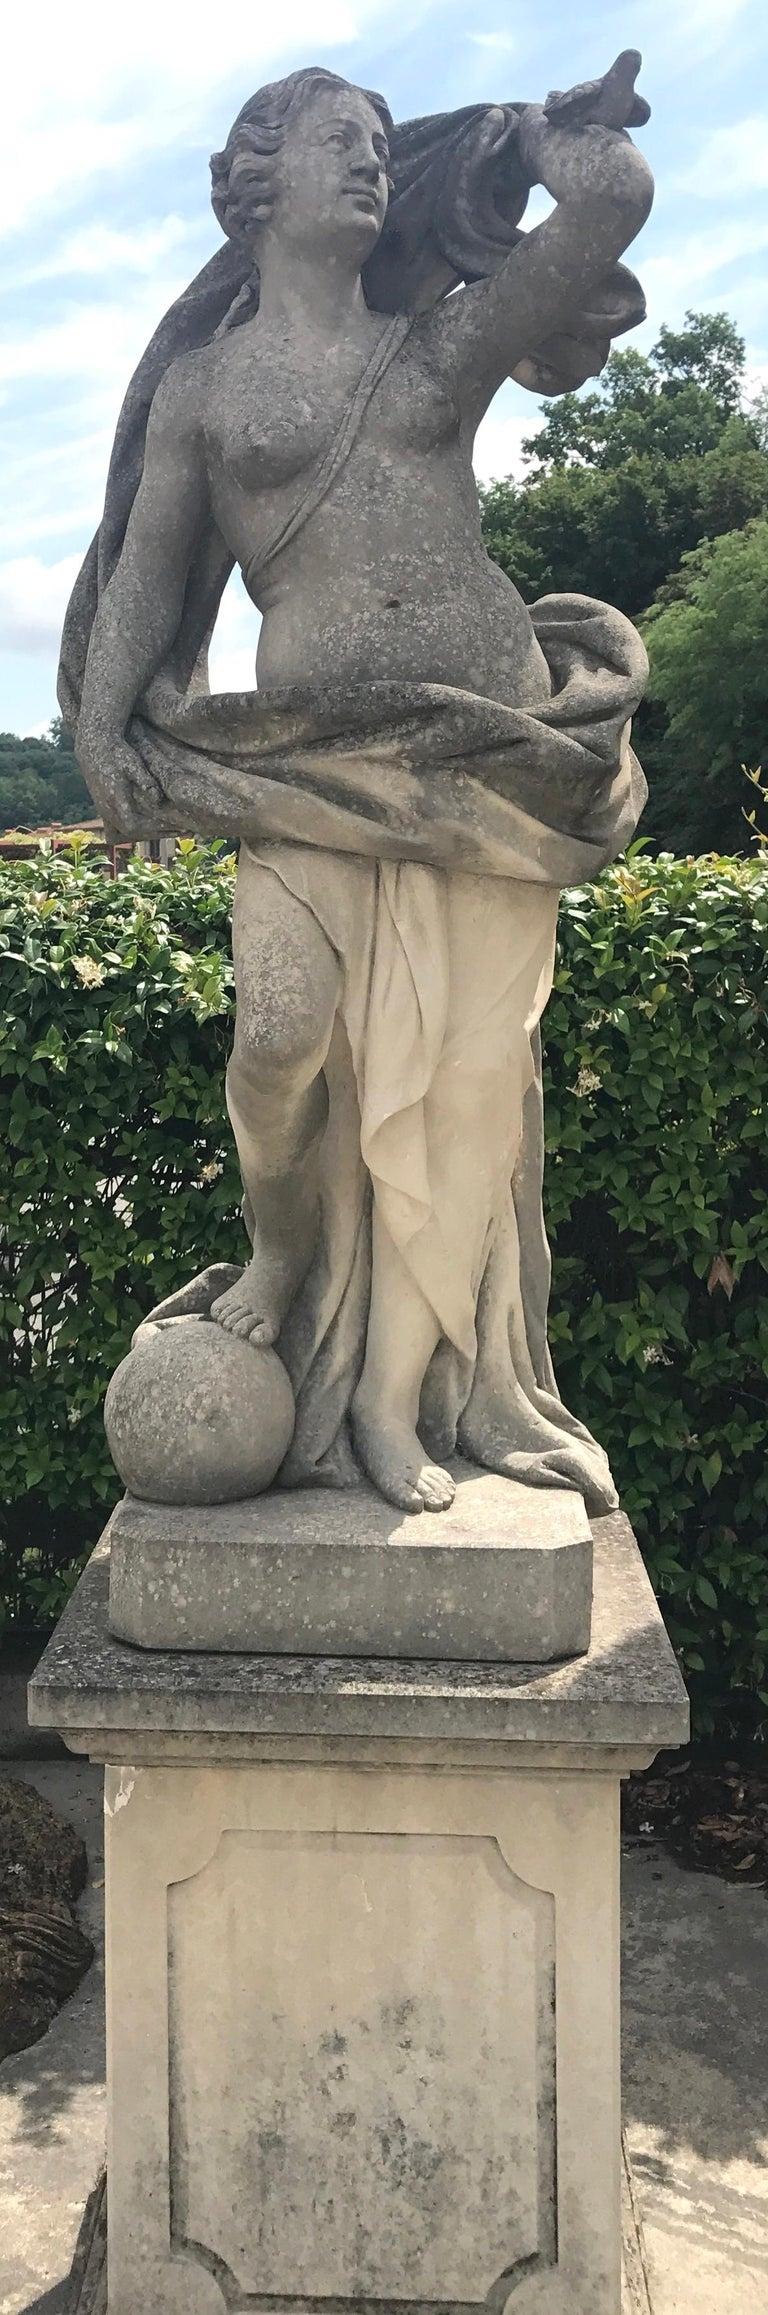 Italian Limestone Garden Sculptures of Aria a  Roman Goddness   - Black Nude Sculpture by Unknown